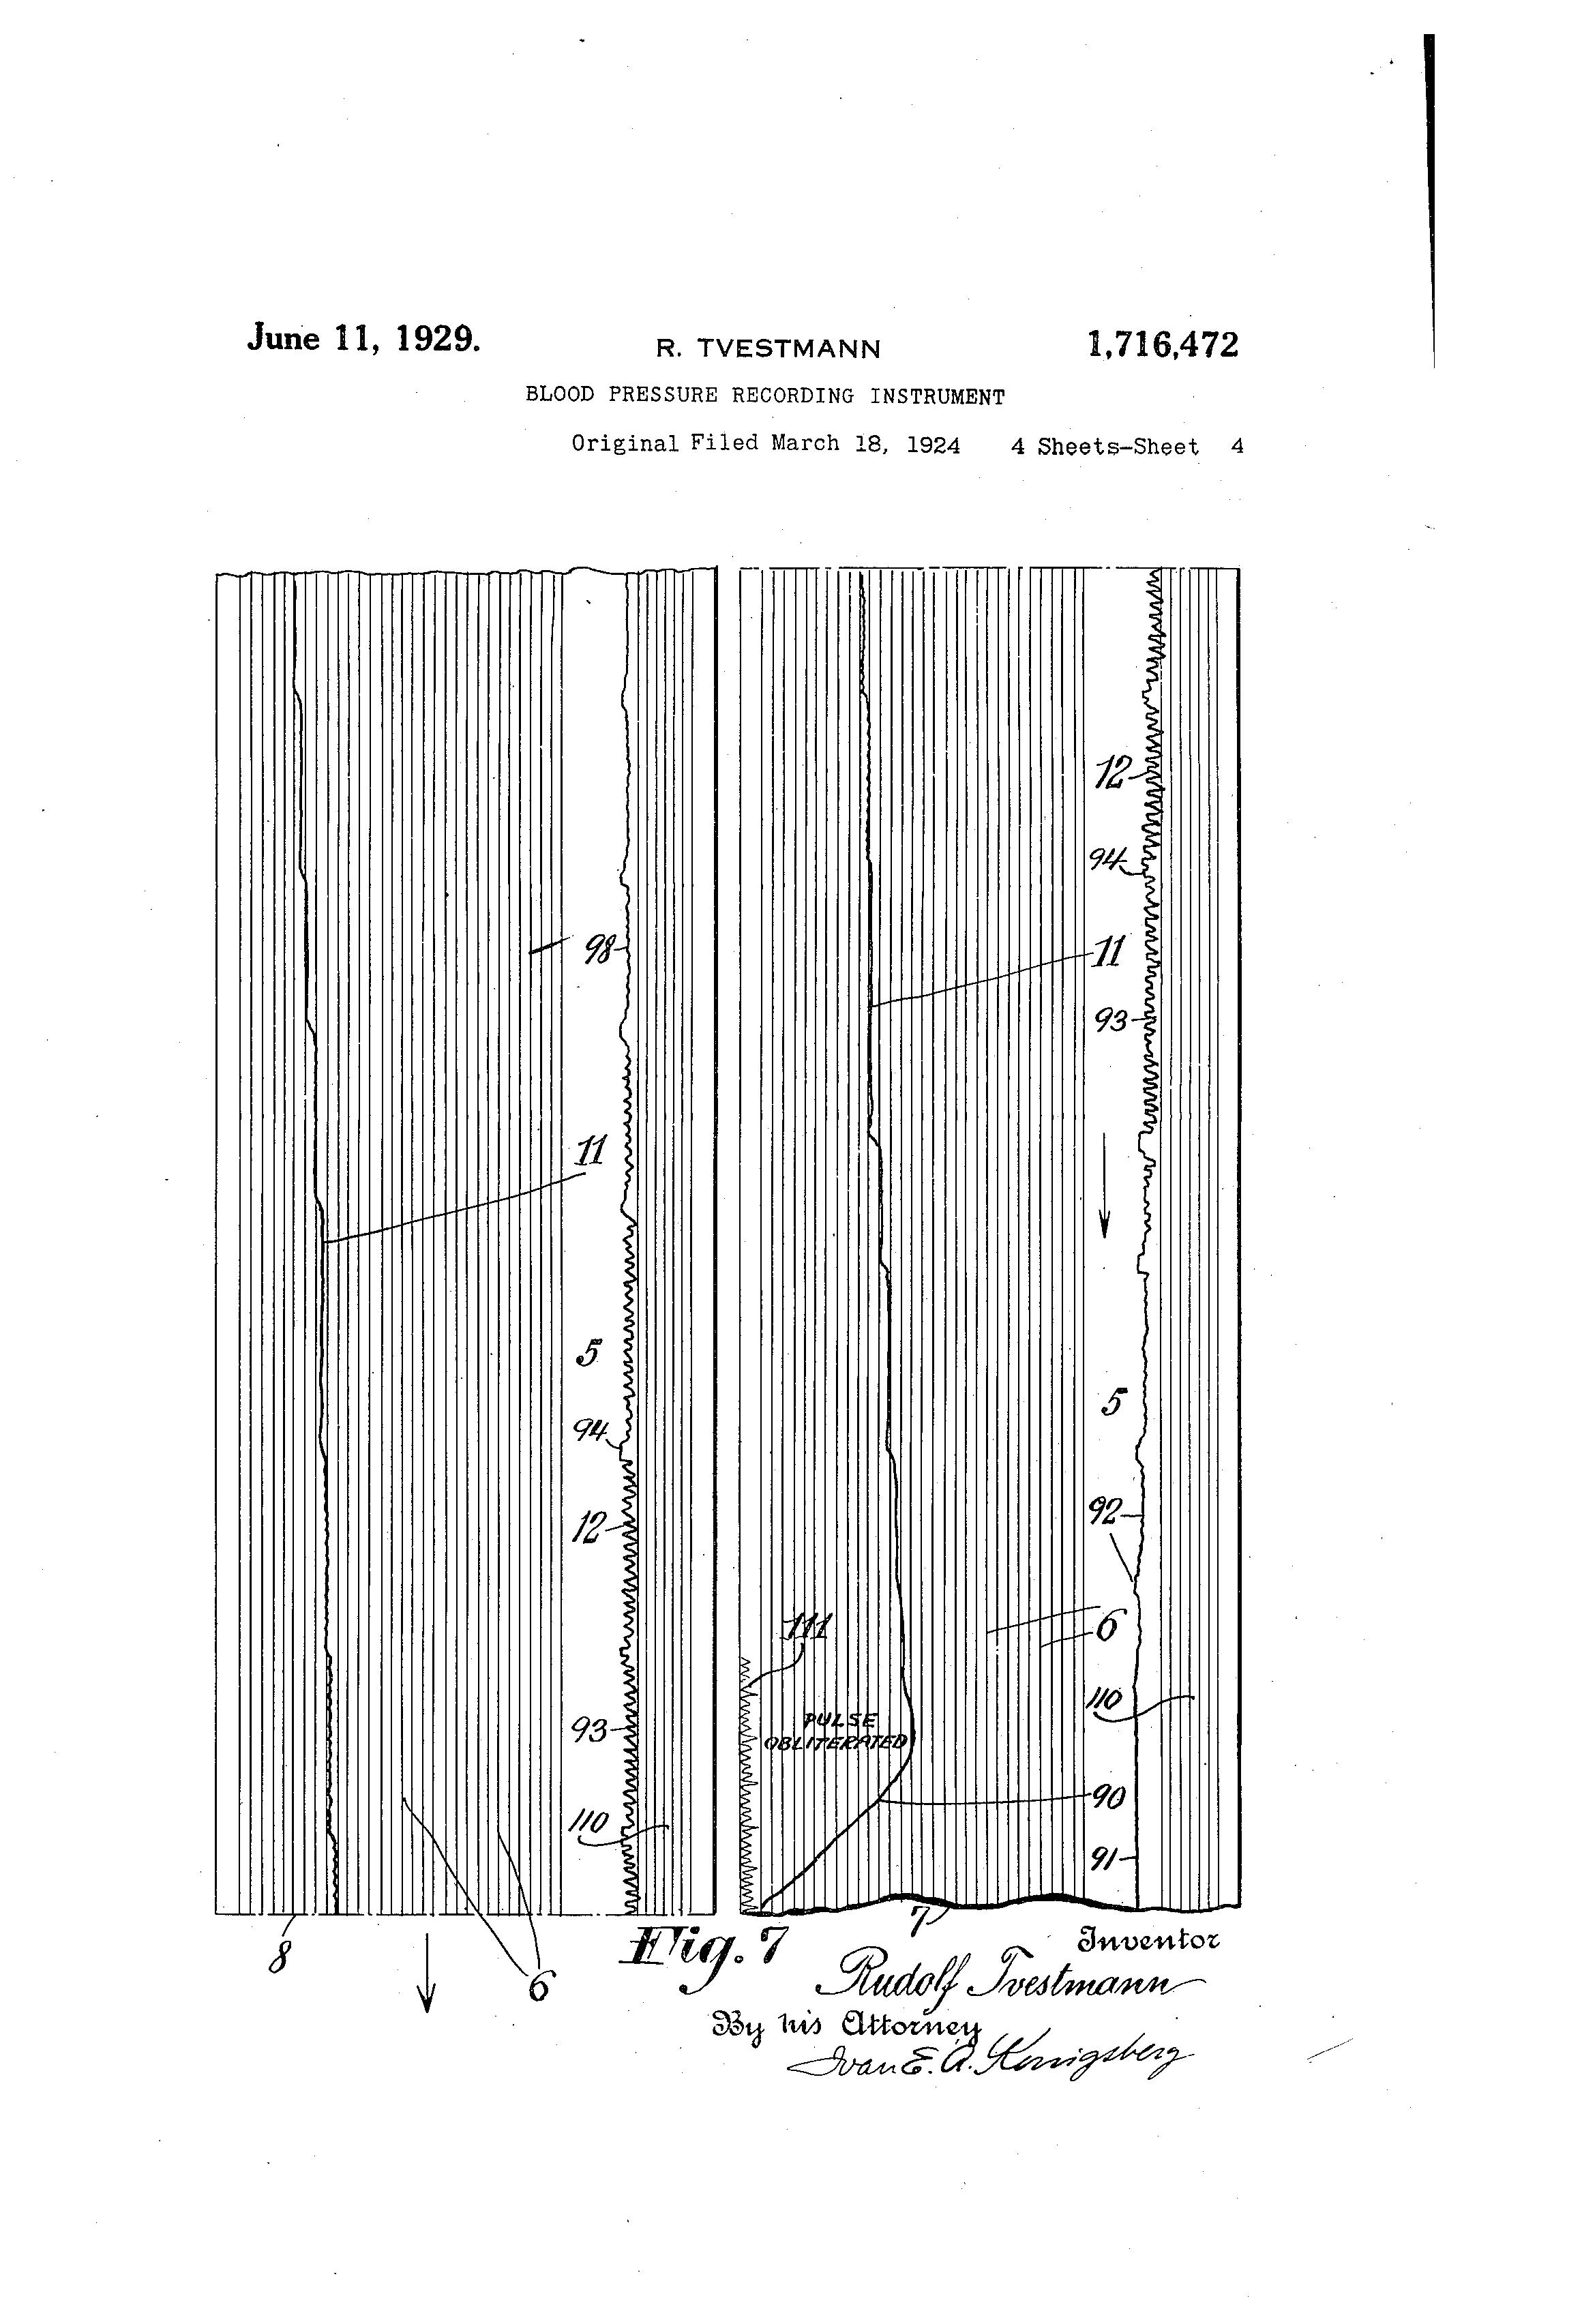 blood pressure record sheet